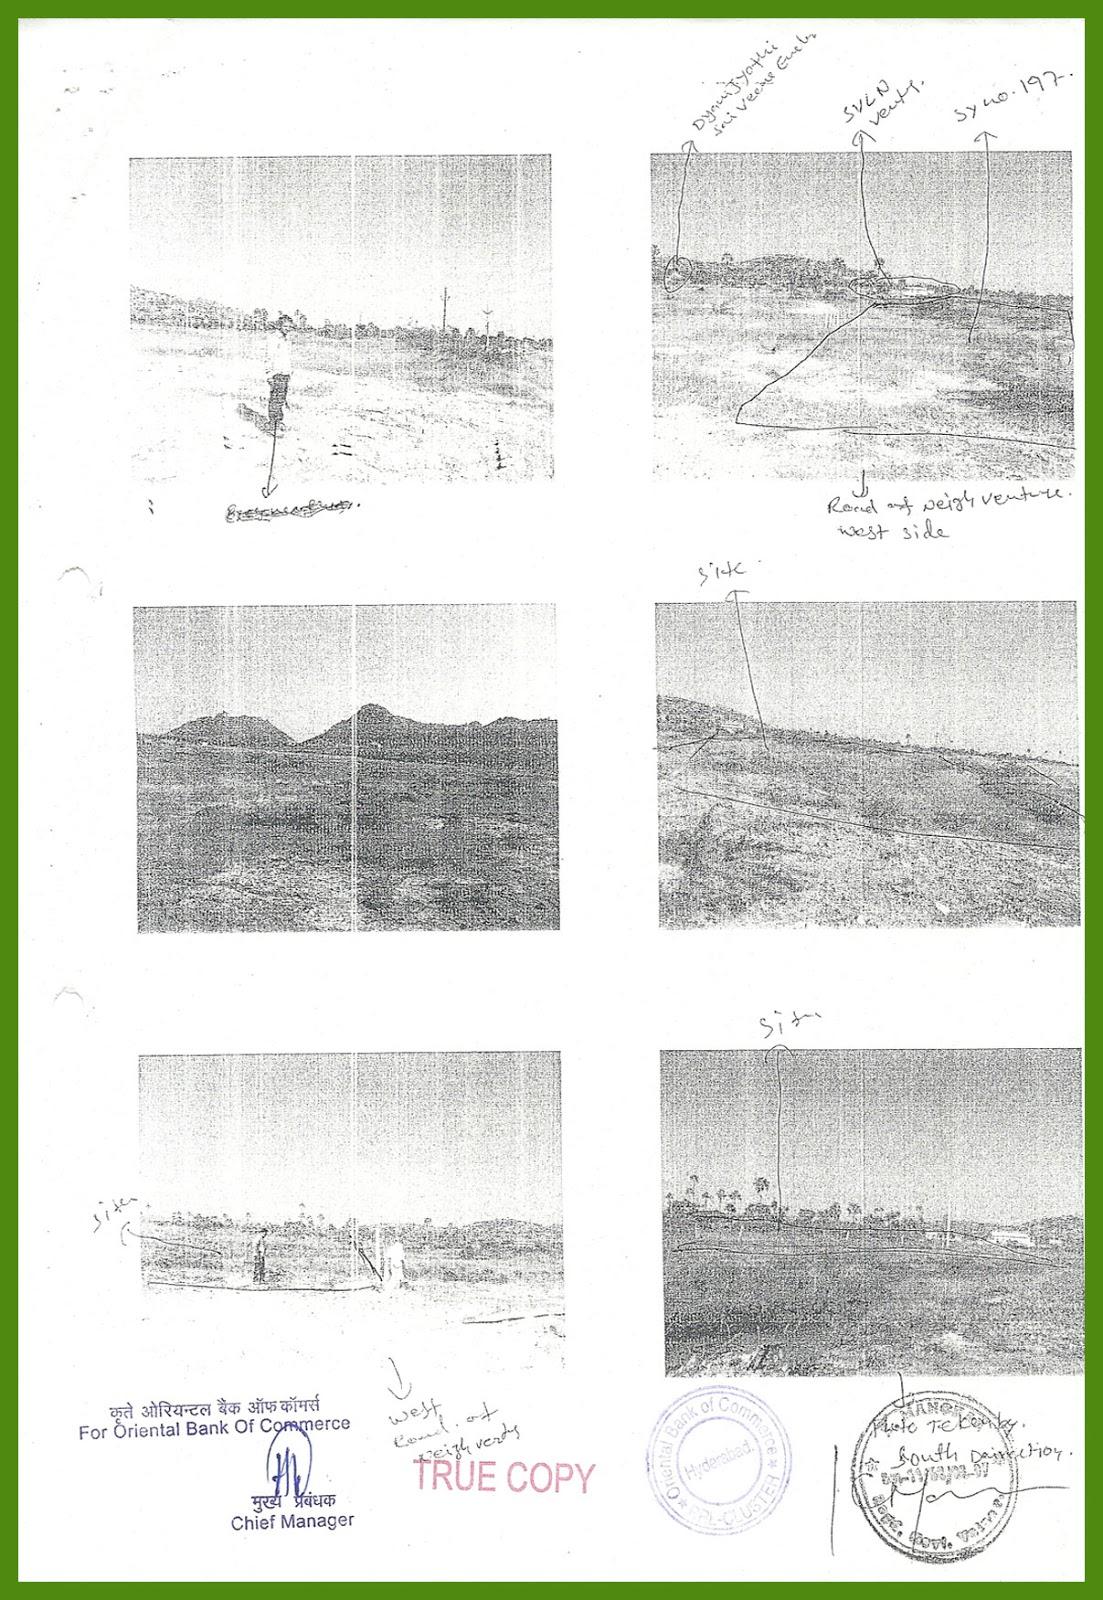 Survey No. 182 and 197 at Yadadri-Bhuvanagiri district-6